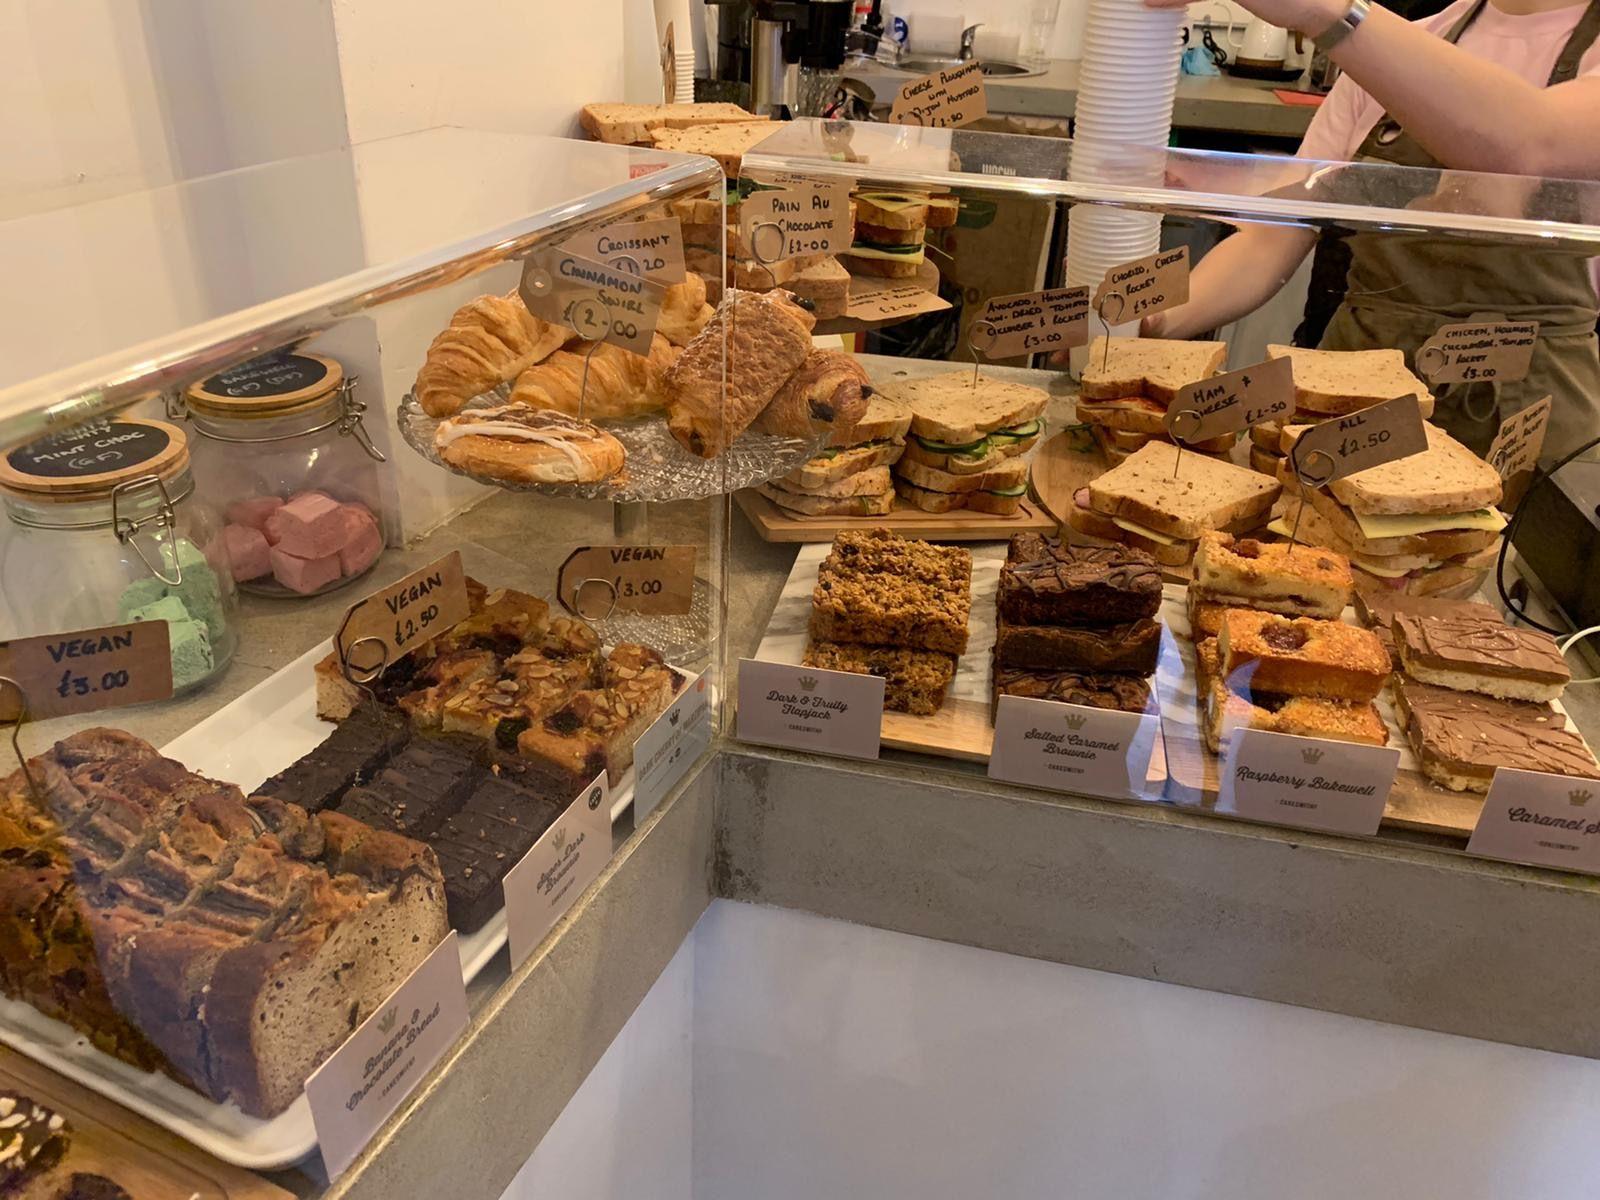 Image may contain: Food, Person, Human, Bakery, Shop